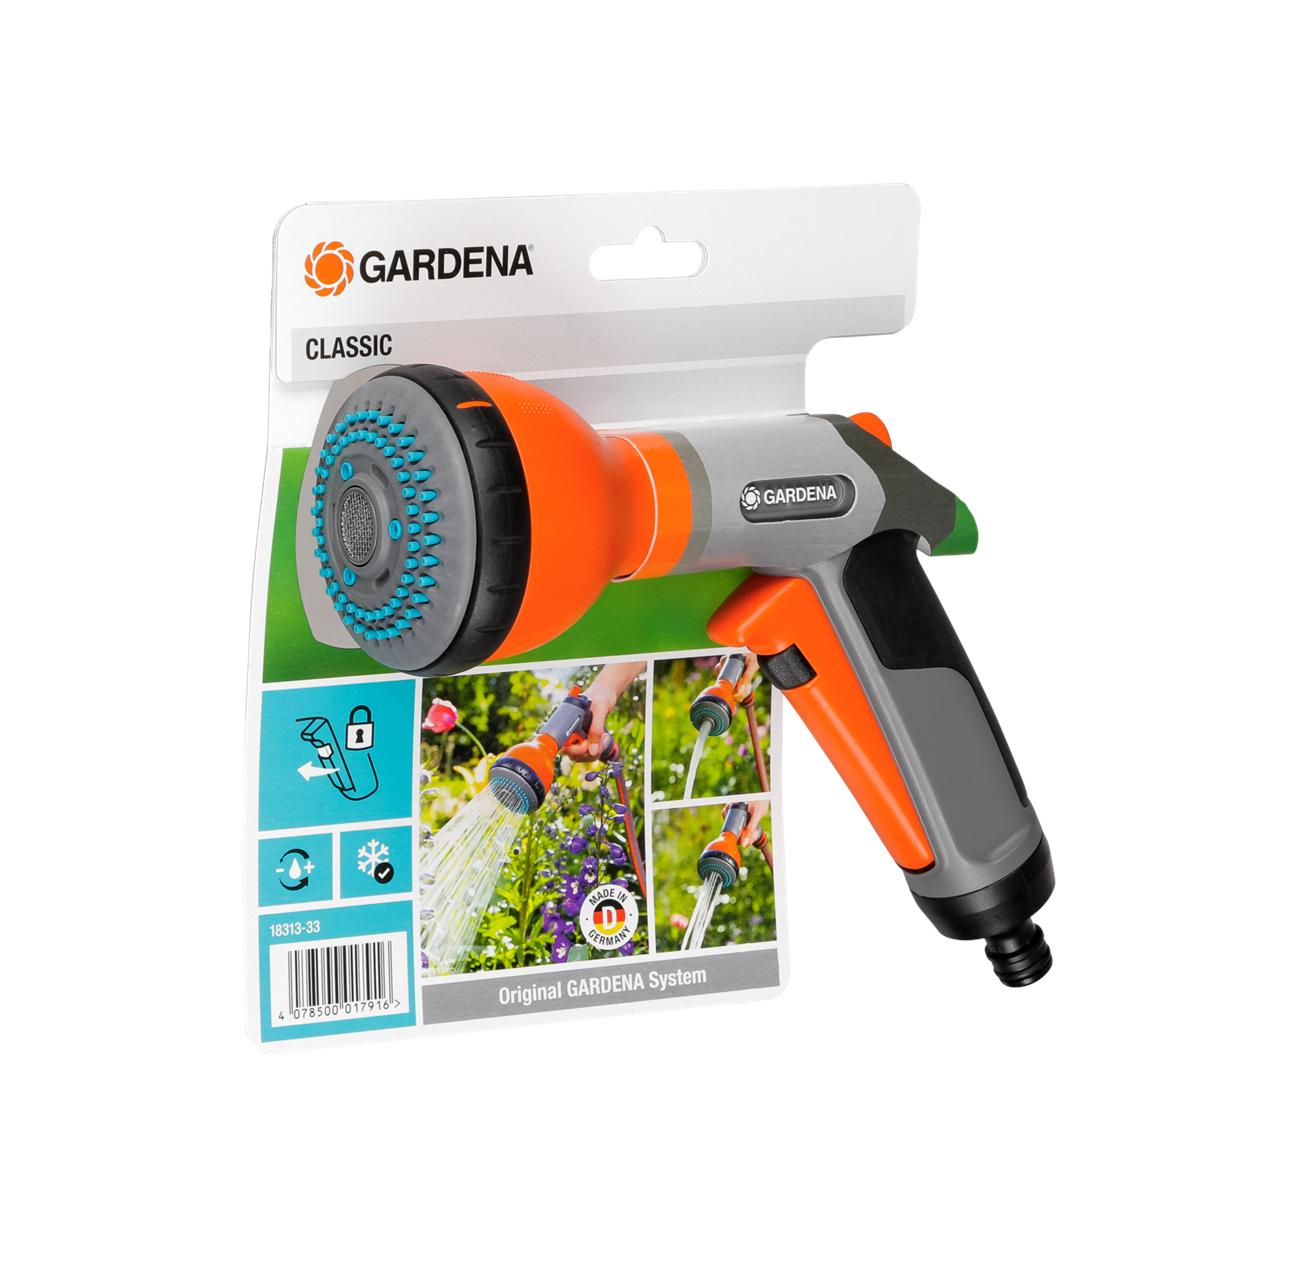 Gardena Classic Multi Sprayer 18313-33 Εκτοξευτήρας Νερού